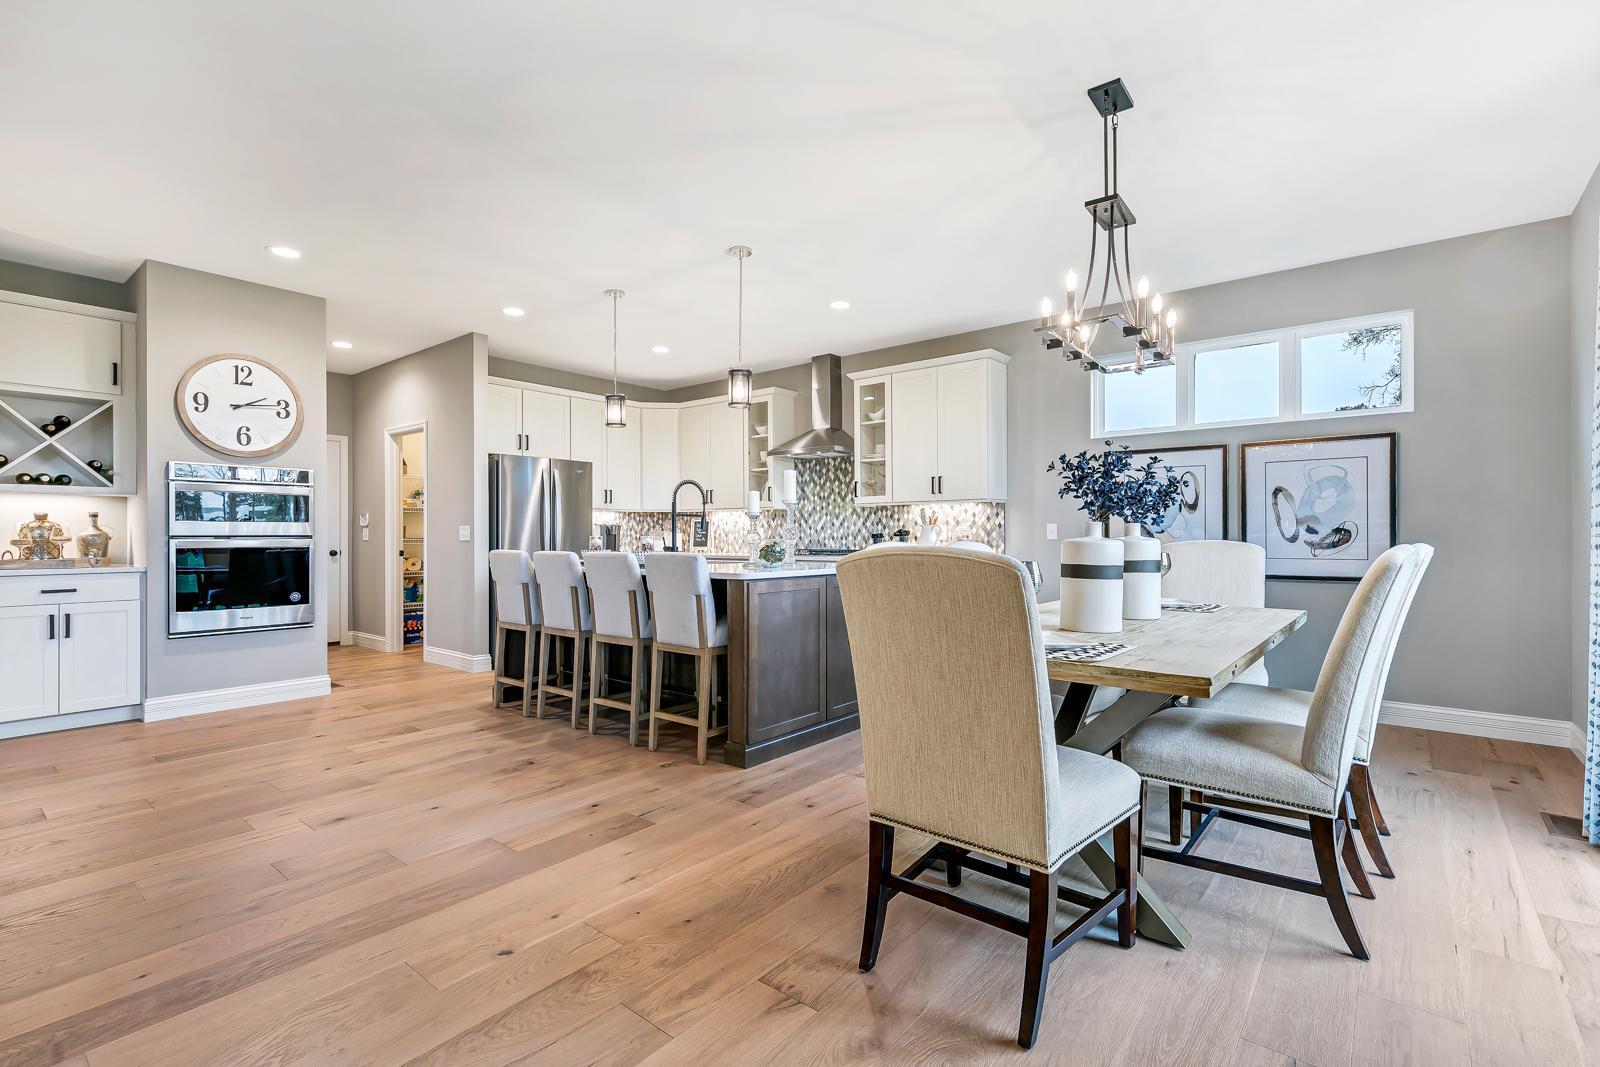 'Wyndemere Estates' by McKelvey Homes in St. Louis